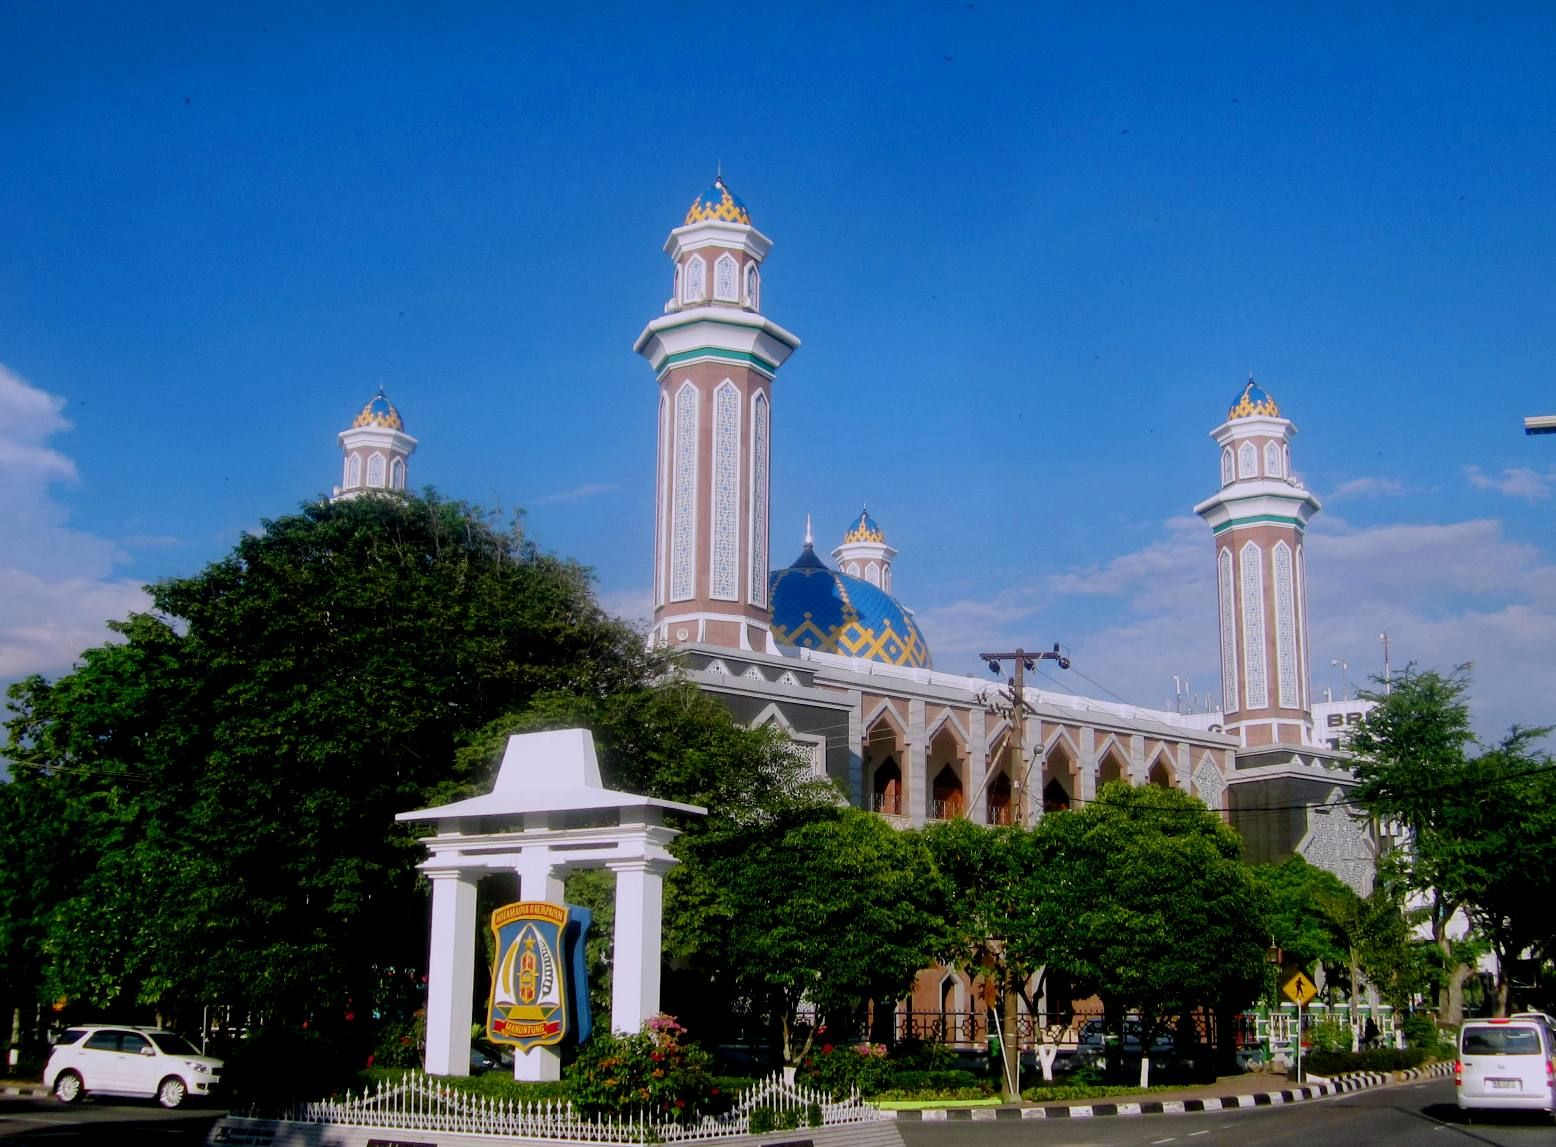 ... Masjid Agung At-Taqwa Kota Balikpapan, Kalimantan Timur, Indonesia